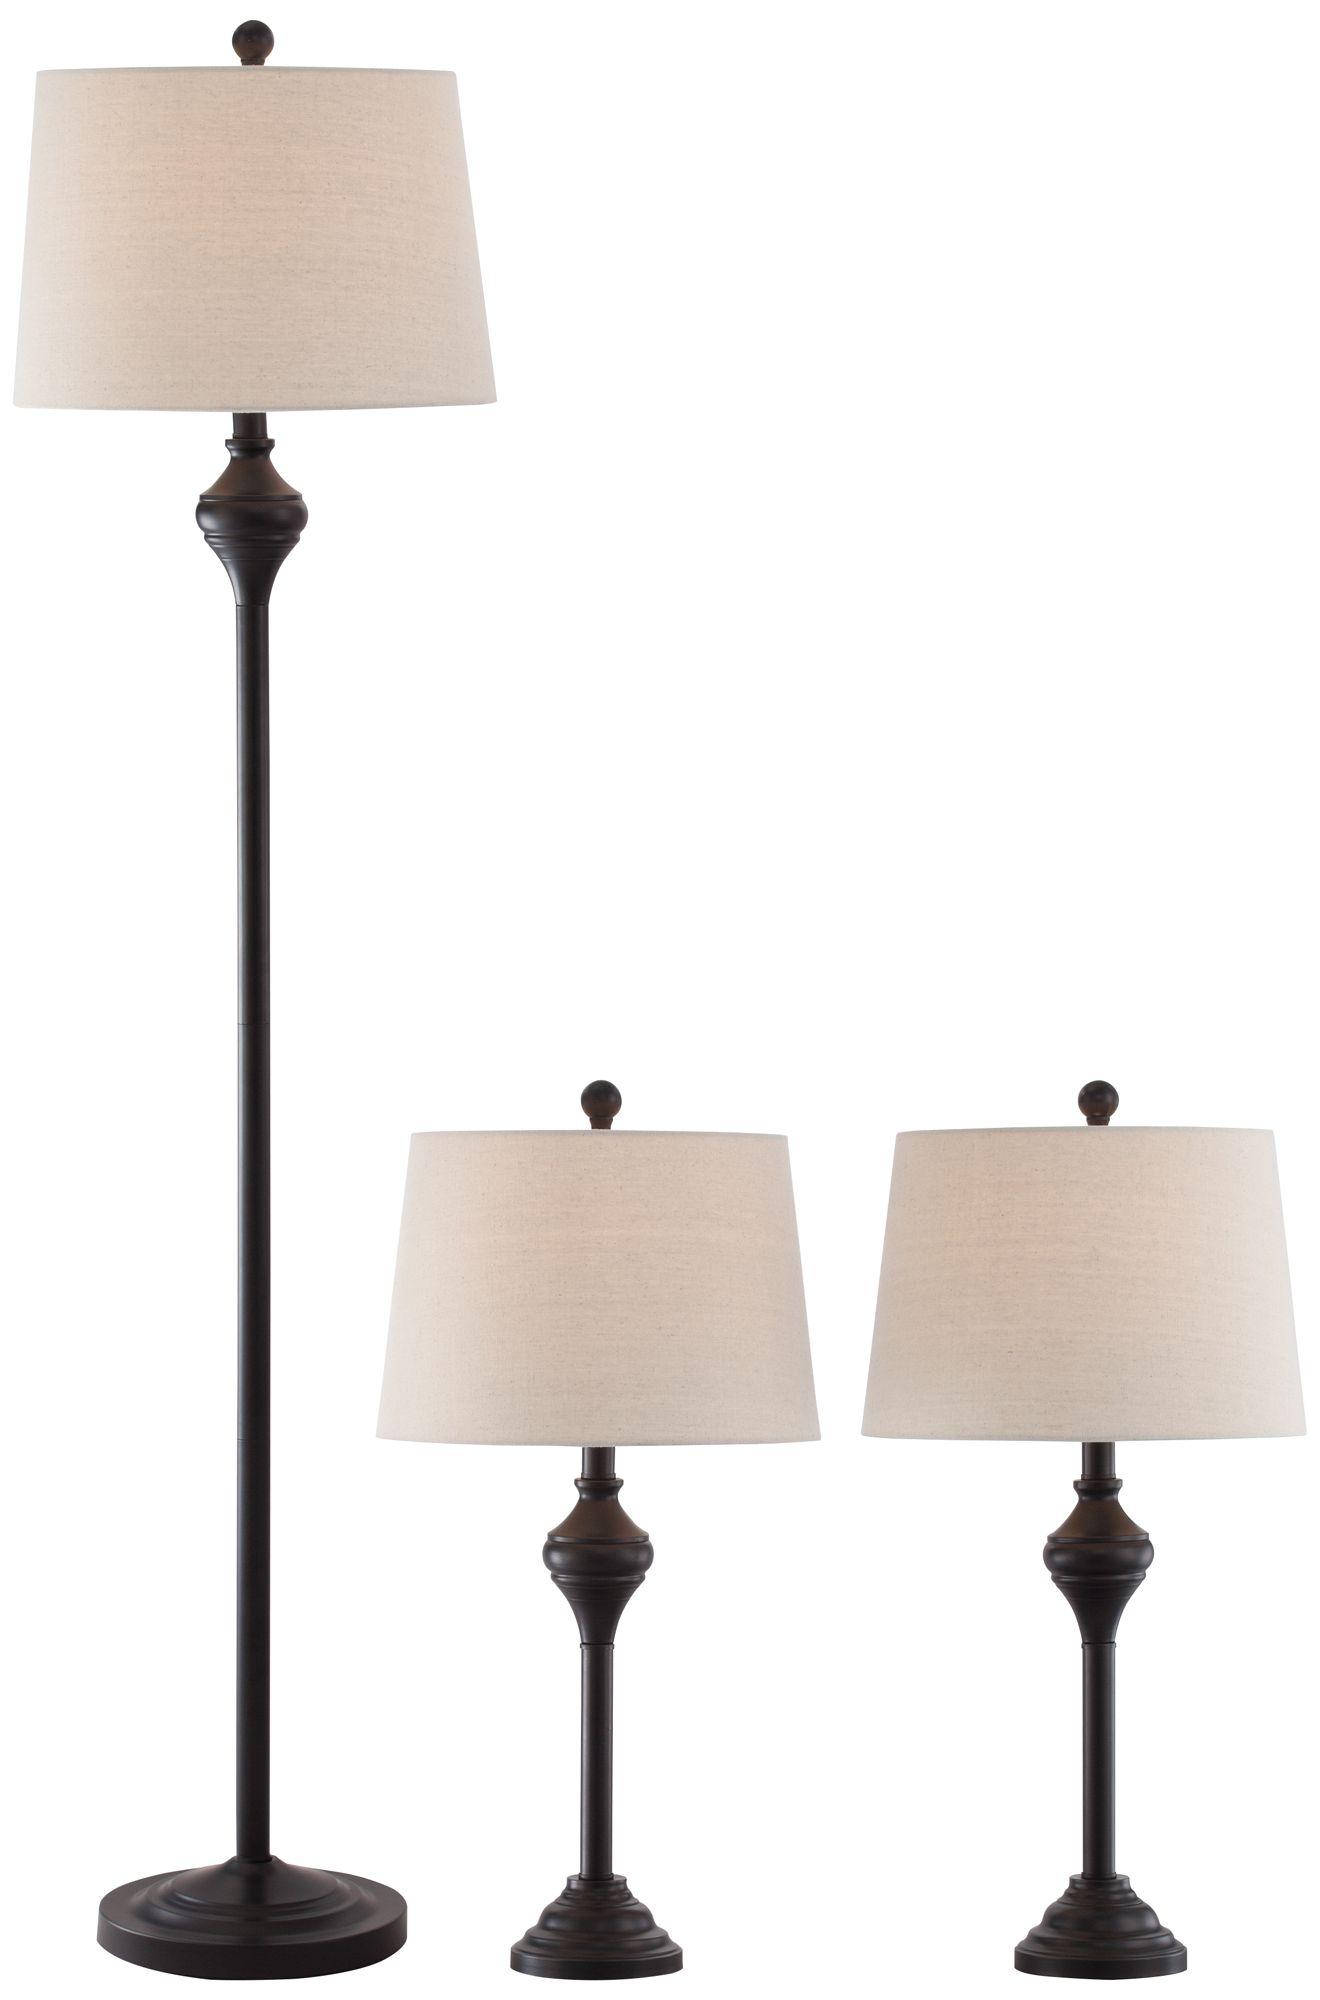 Mason Bronze Floor and Table L& Set of 3  sc 1 st  L&s Plus & Floor Lamp Sets - Matching Table \u0026 Floor Designs   Lamps Plus